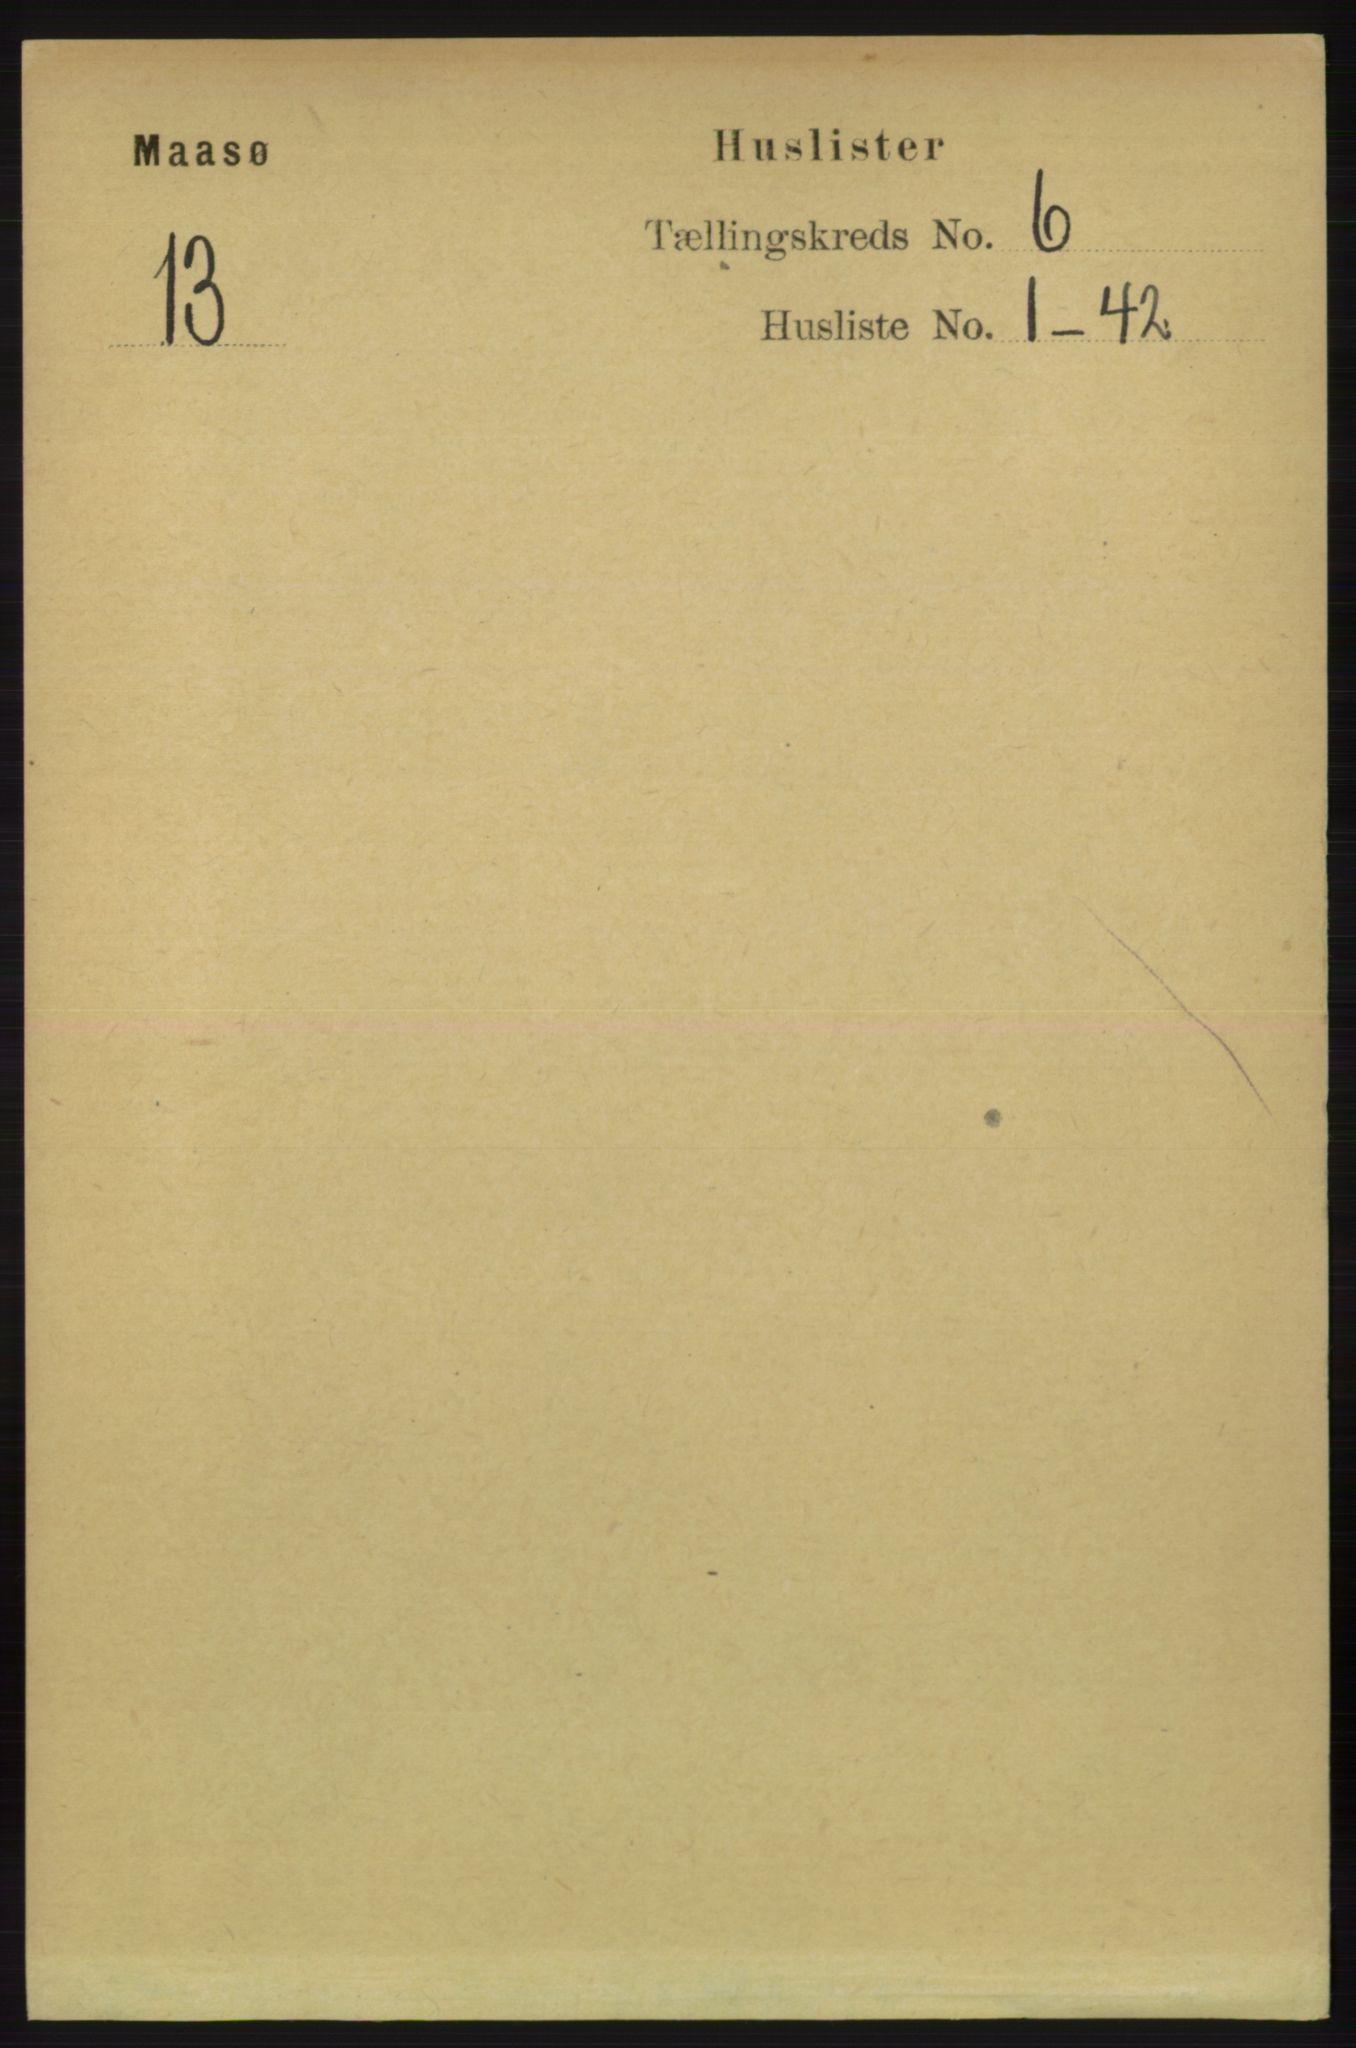 RA, Folketelling 1891 for 2018 Måsøy herred, 1891, s. 1078